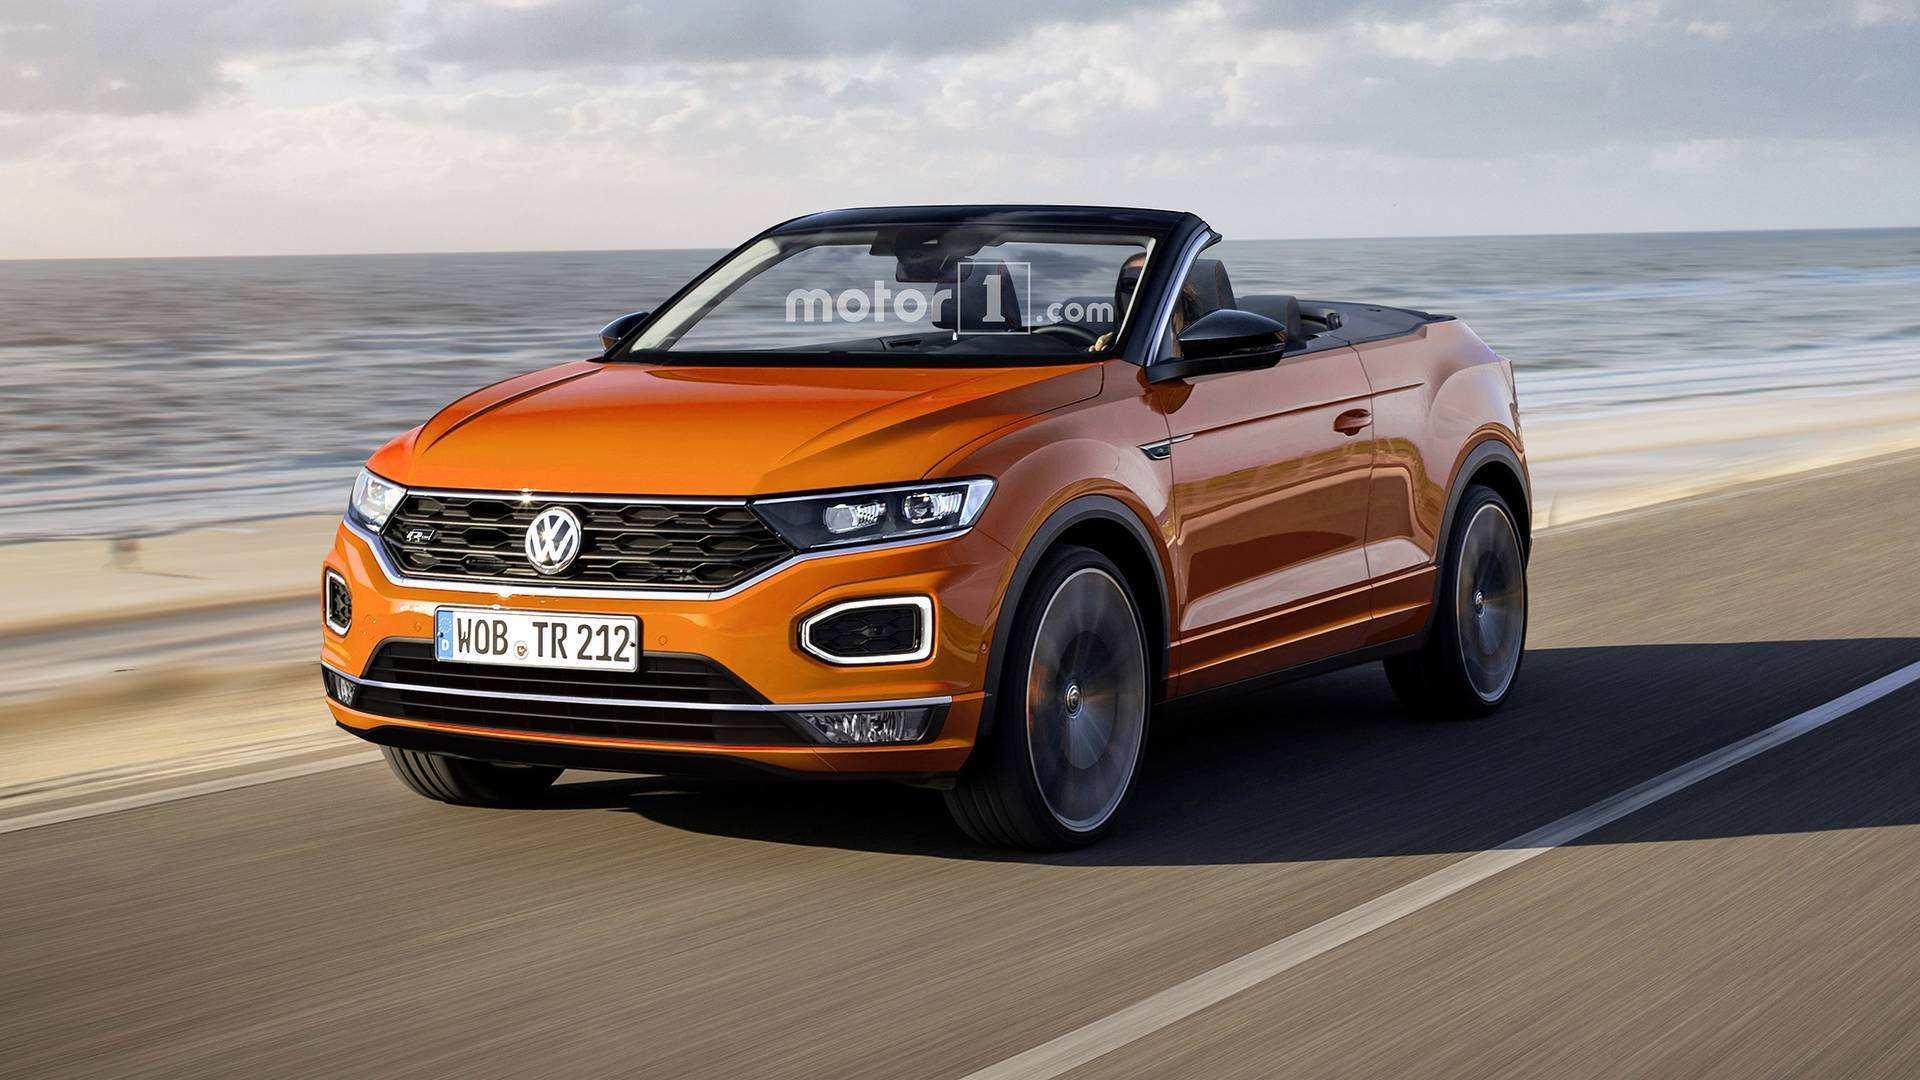 86 Best Review Volkswagen T Roc Cabrio 2020 Spesification for Volkswagen T Roc Cabrio 2020